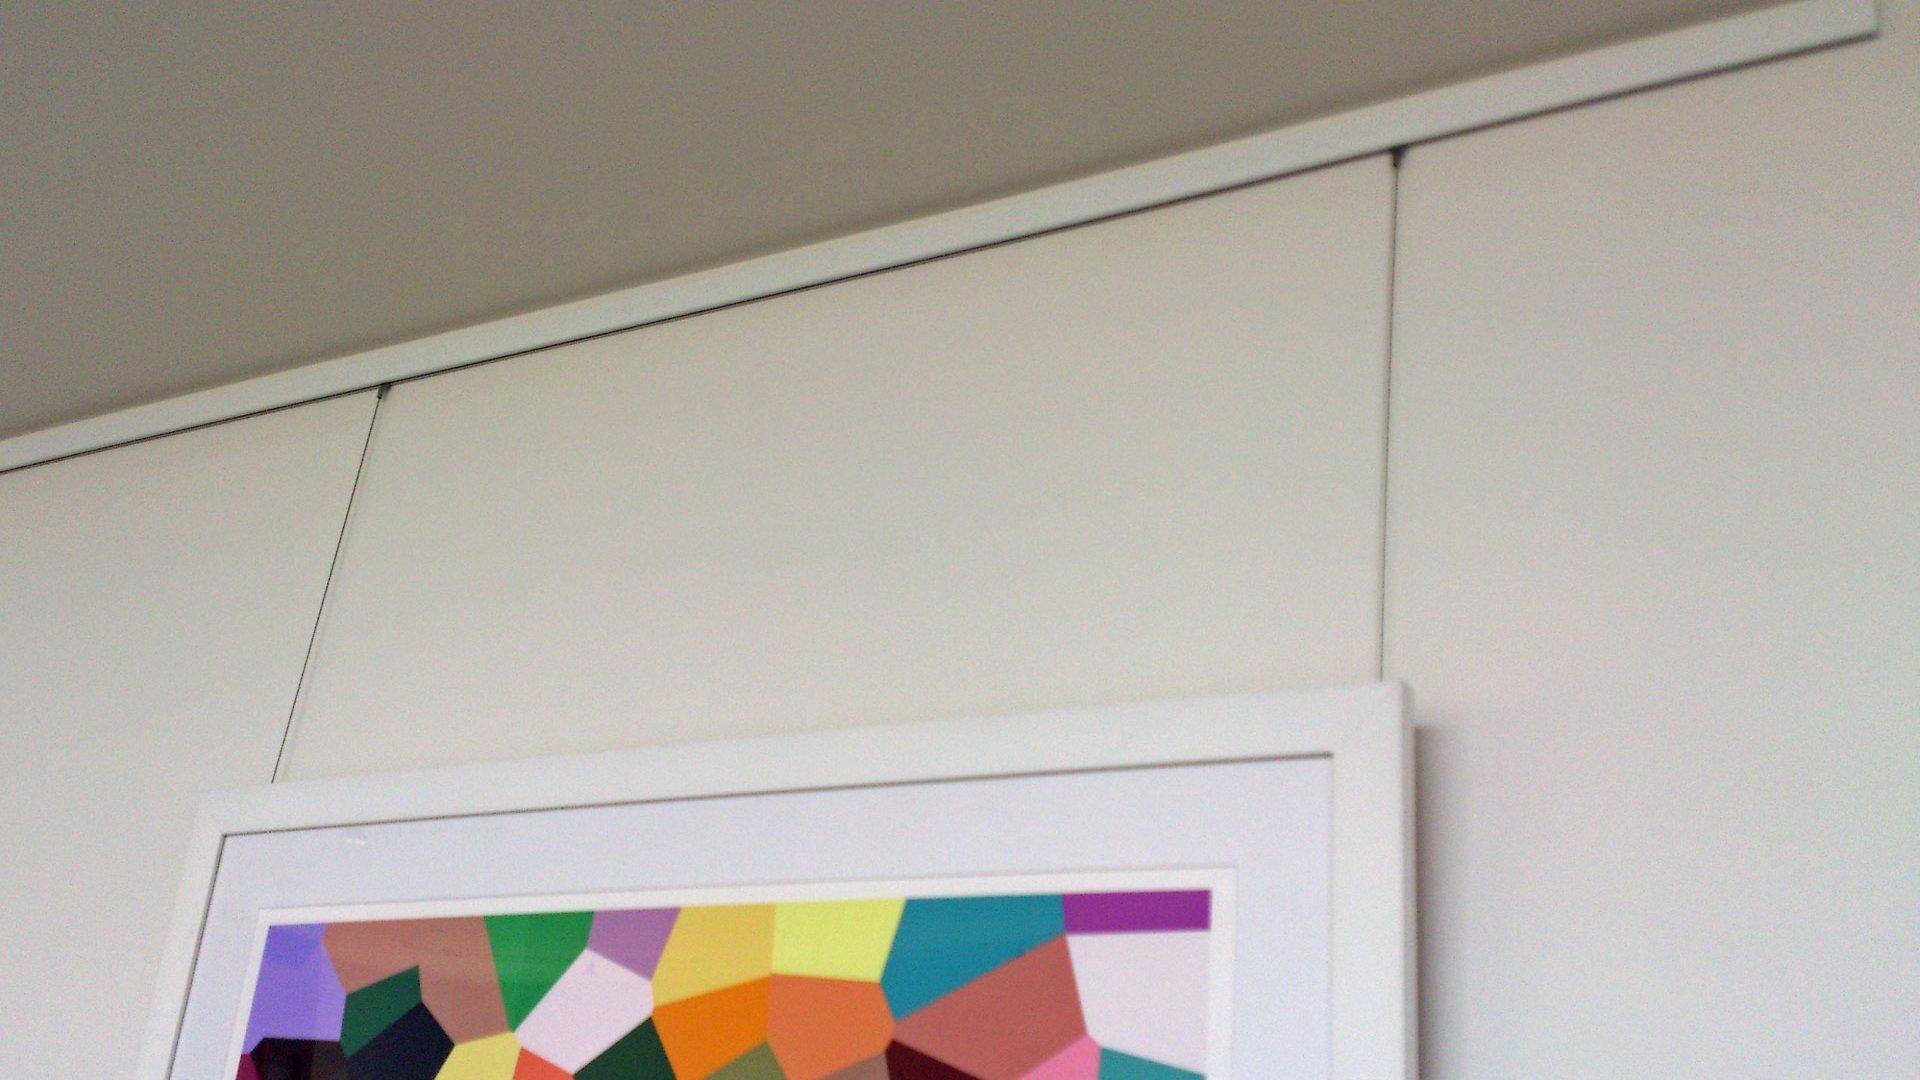 Slimline Art Hanging System